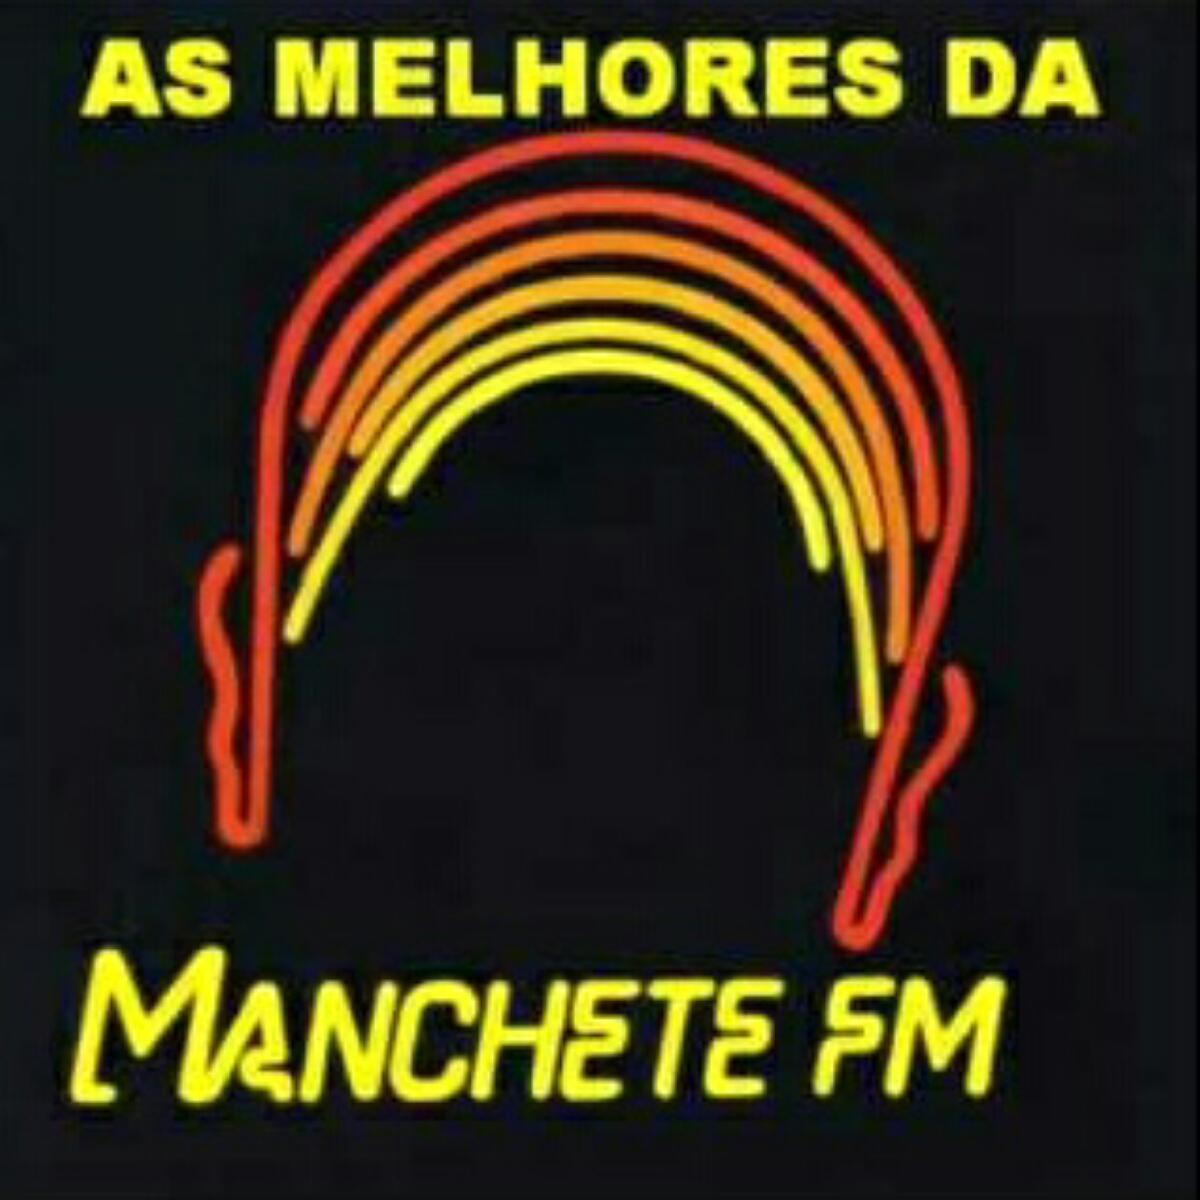 Manchete FM 89,03 MHz's